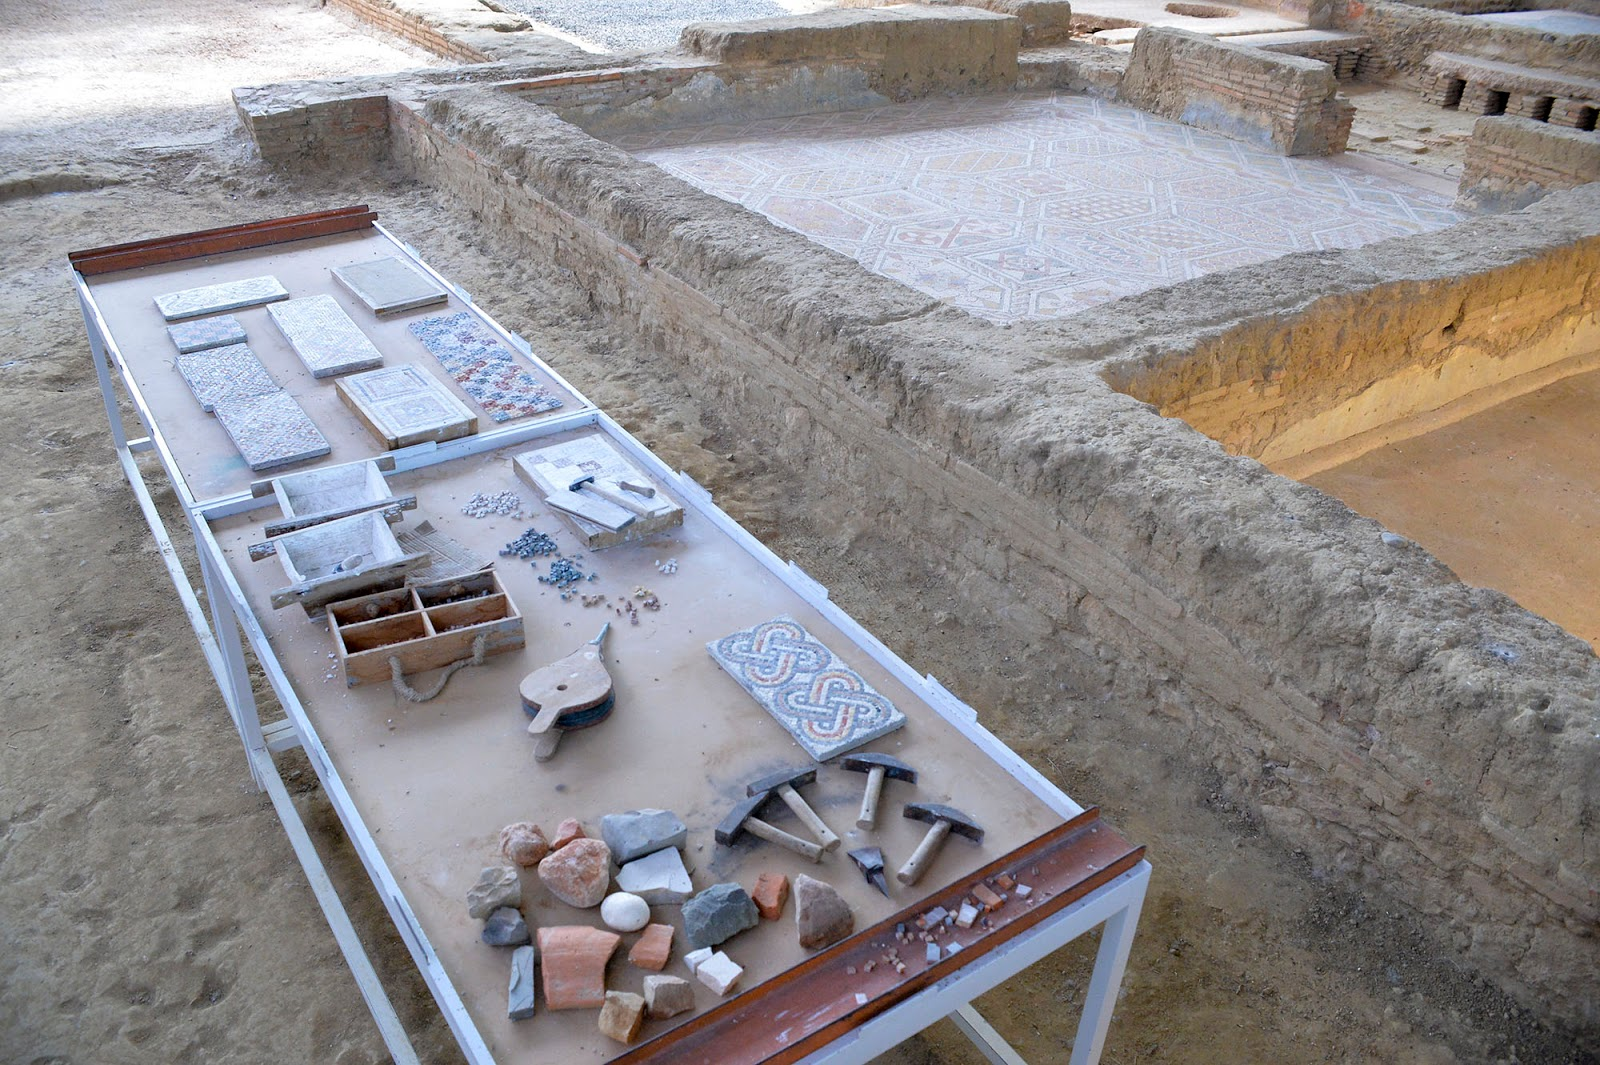 villa romana olmeda palencia roman ruins spain